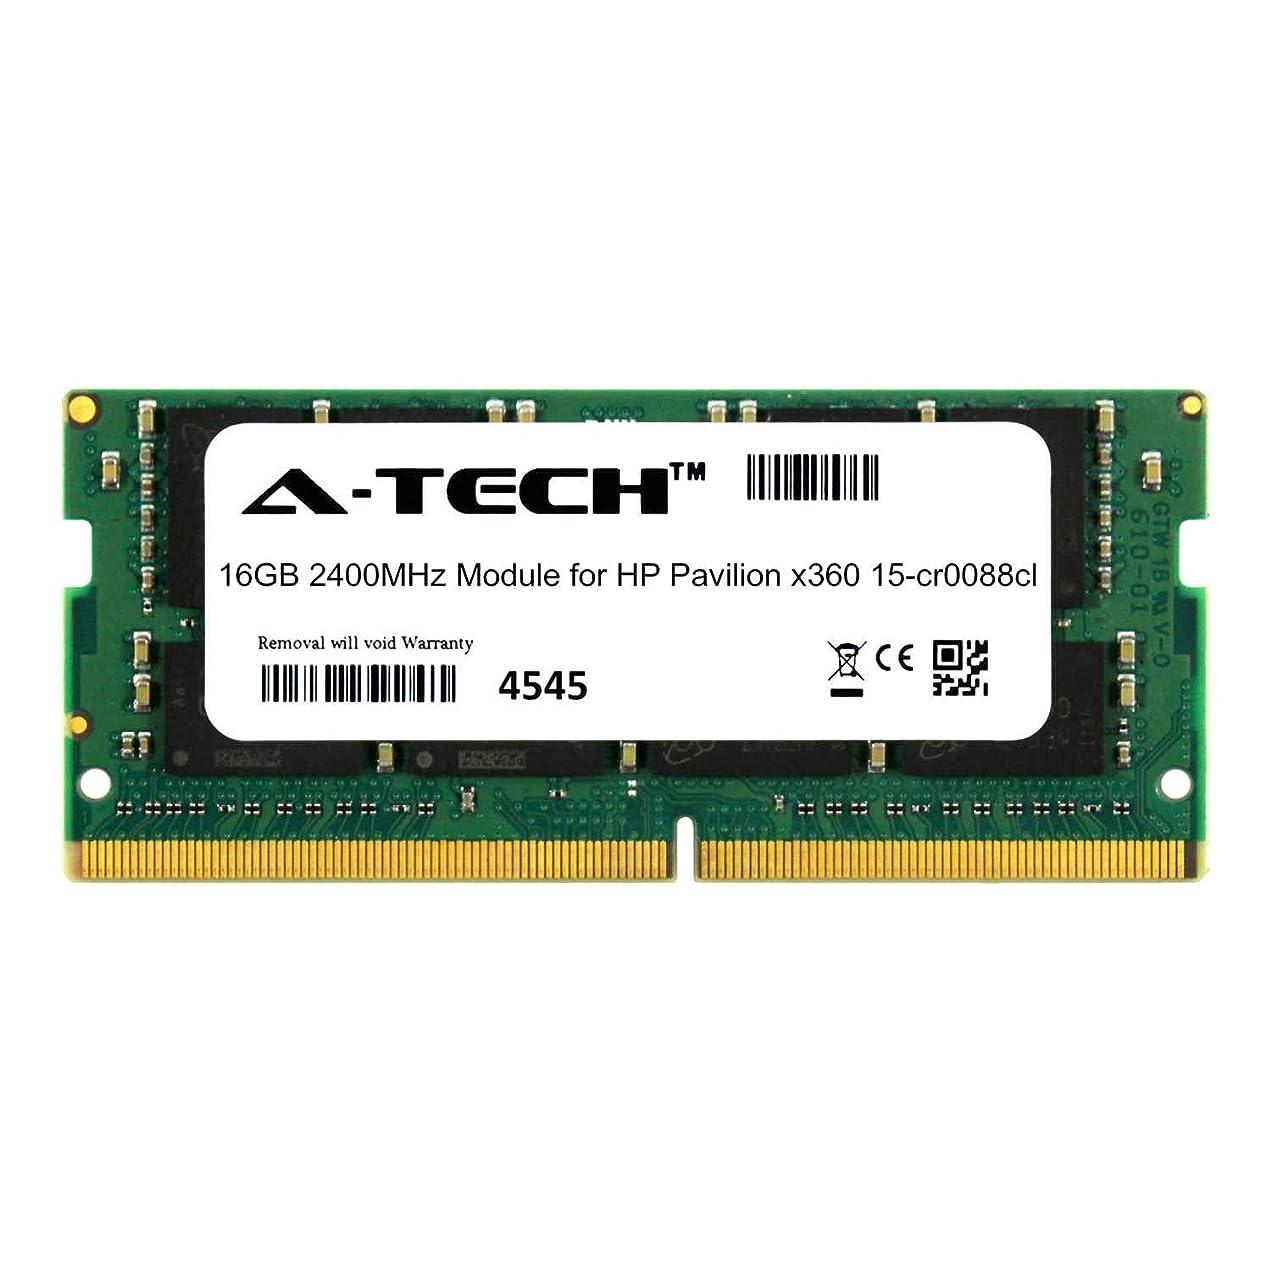 A-Tech 16GB Module for HP Pavilion x360 15-cr0088cl Laptop & Notebook Compatible DDR4 2400Mhz Memory Ram (ATMS313652A25831X1)